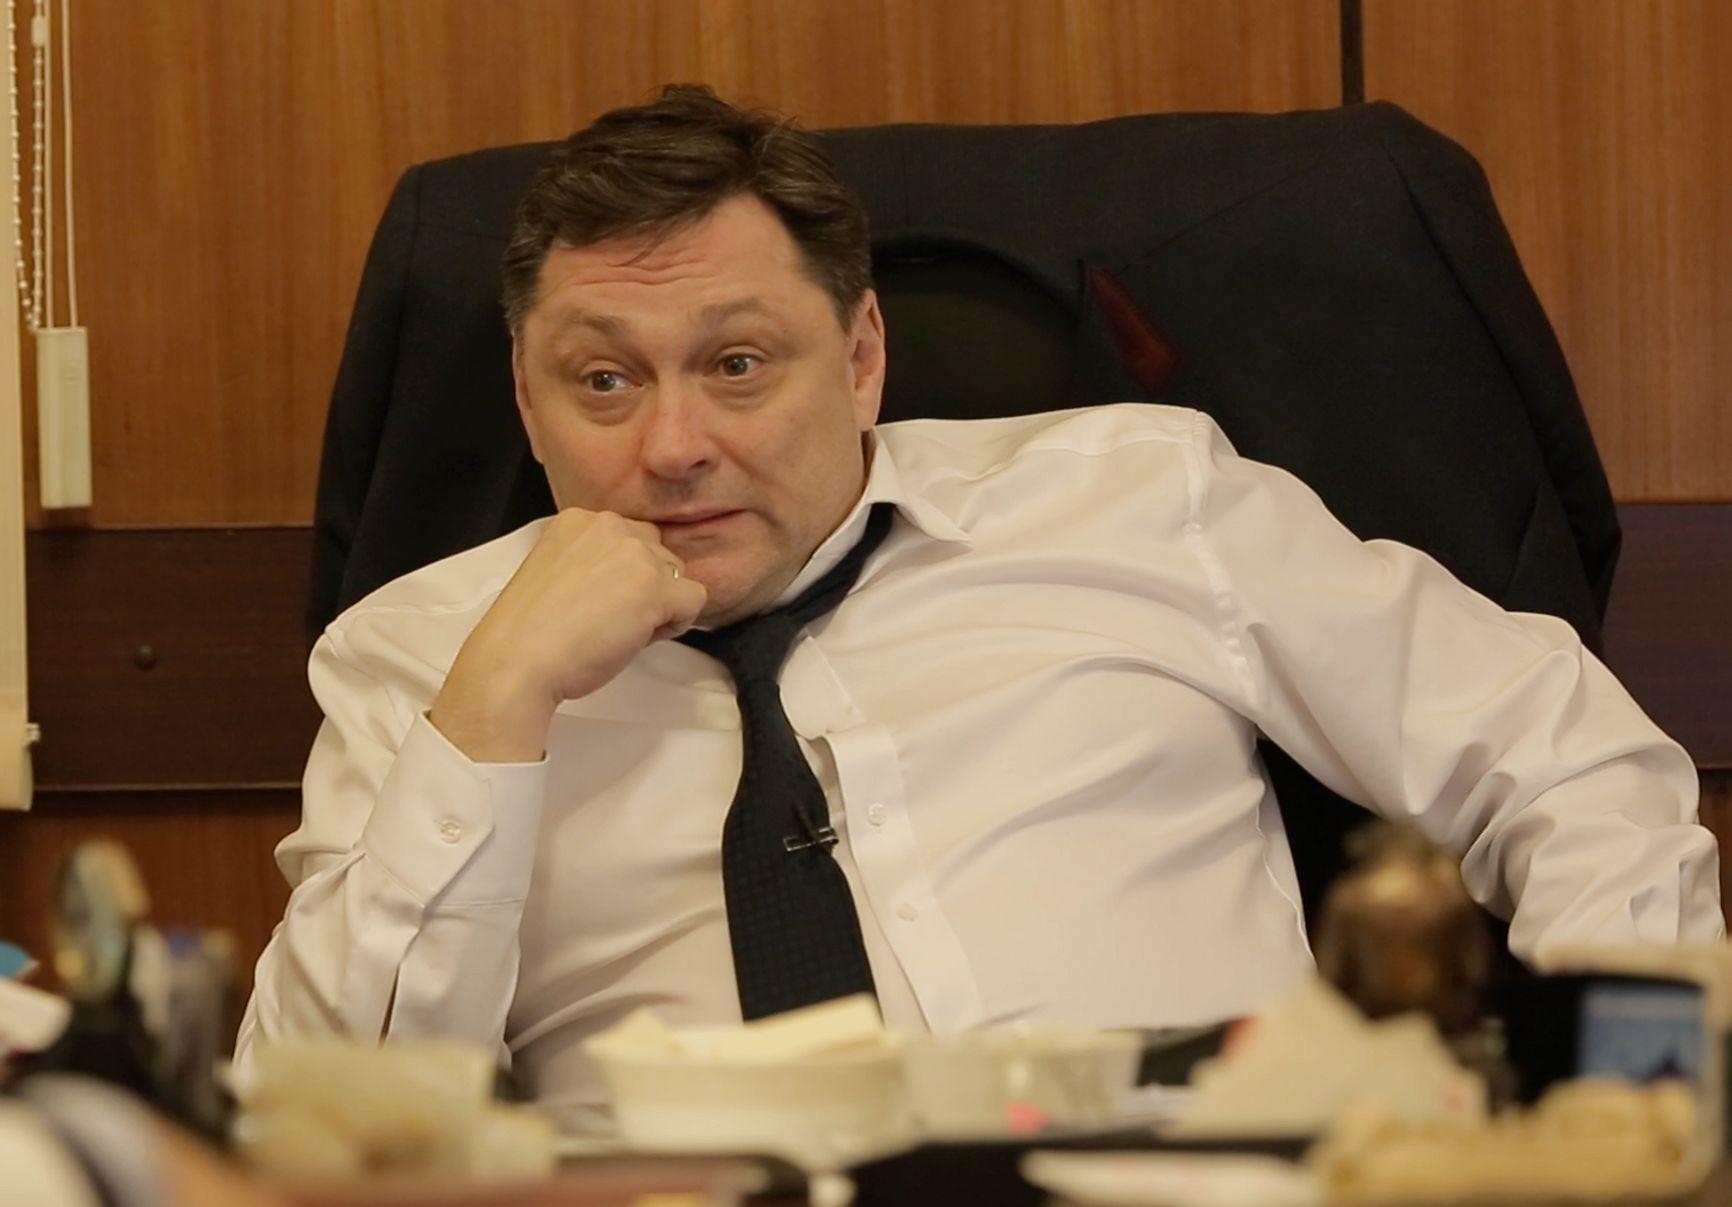 Главврач Алексей Свет намекнул на то, что Кара-Мурза младший был пьян